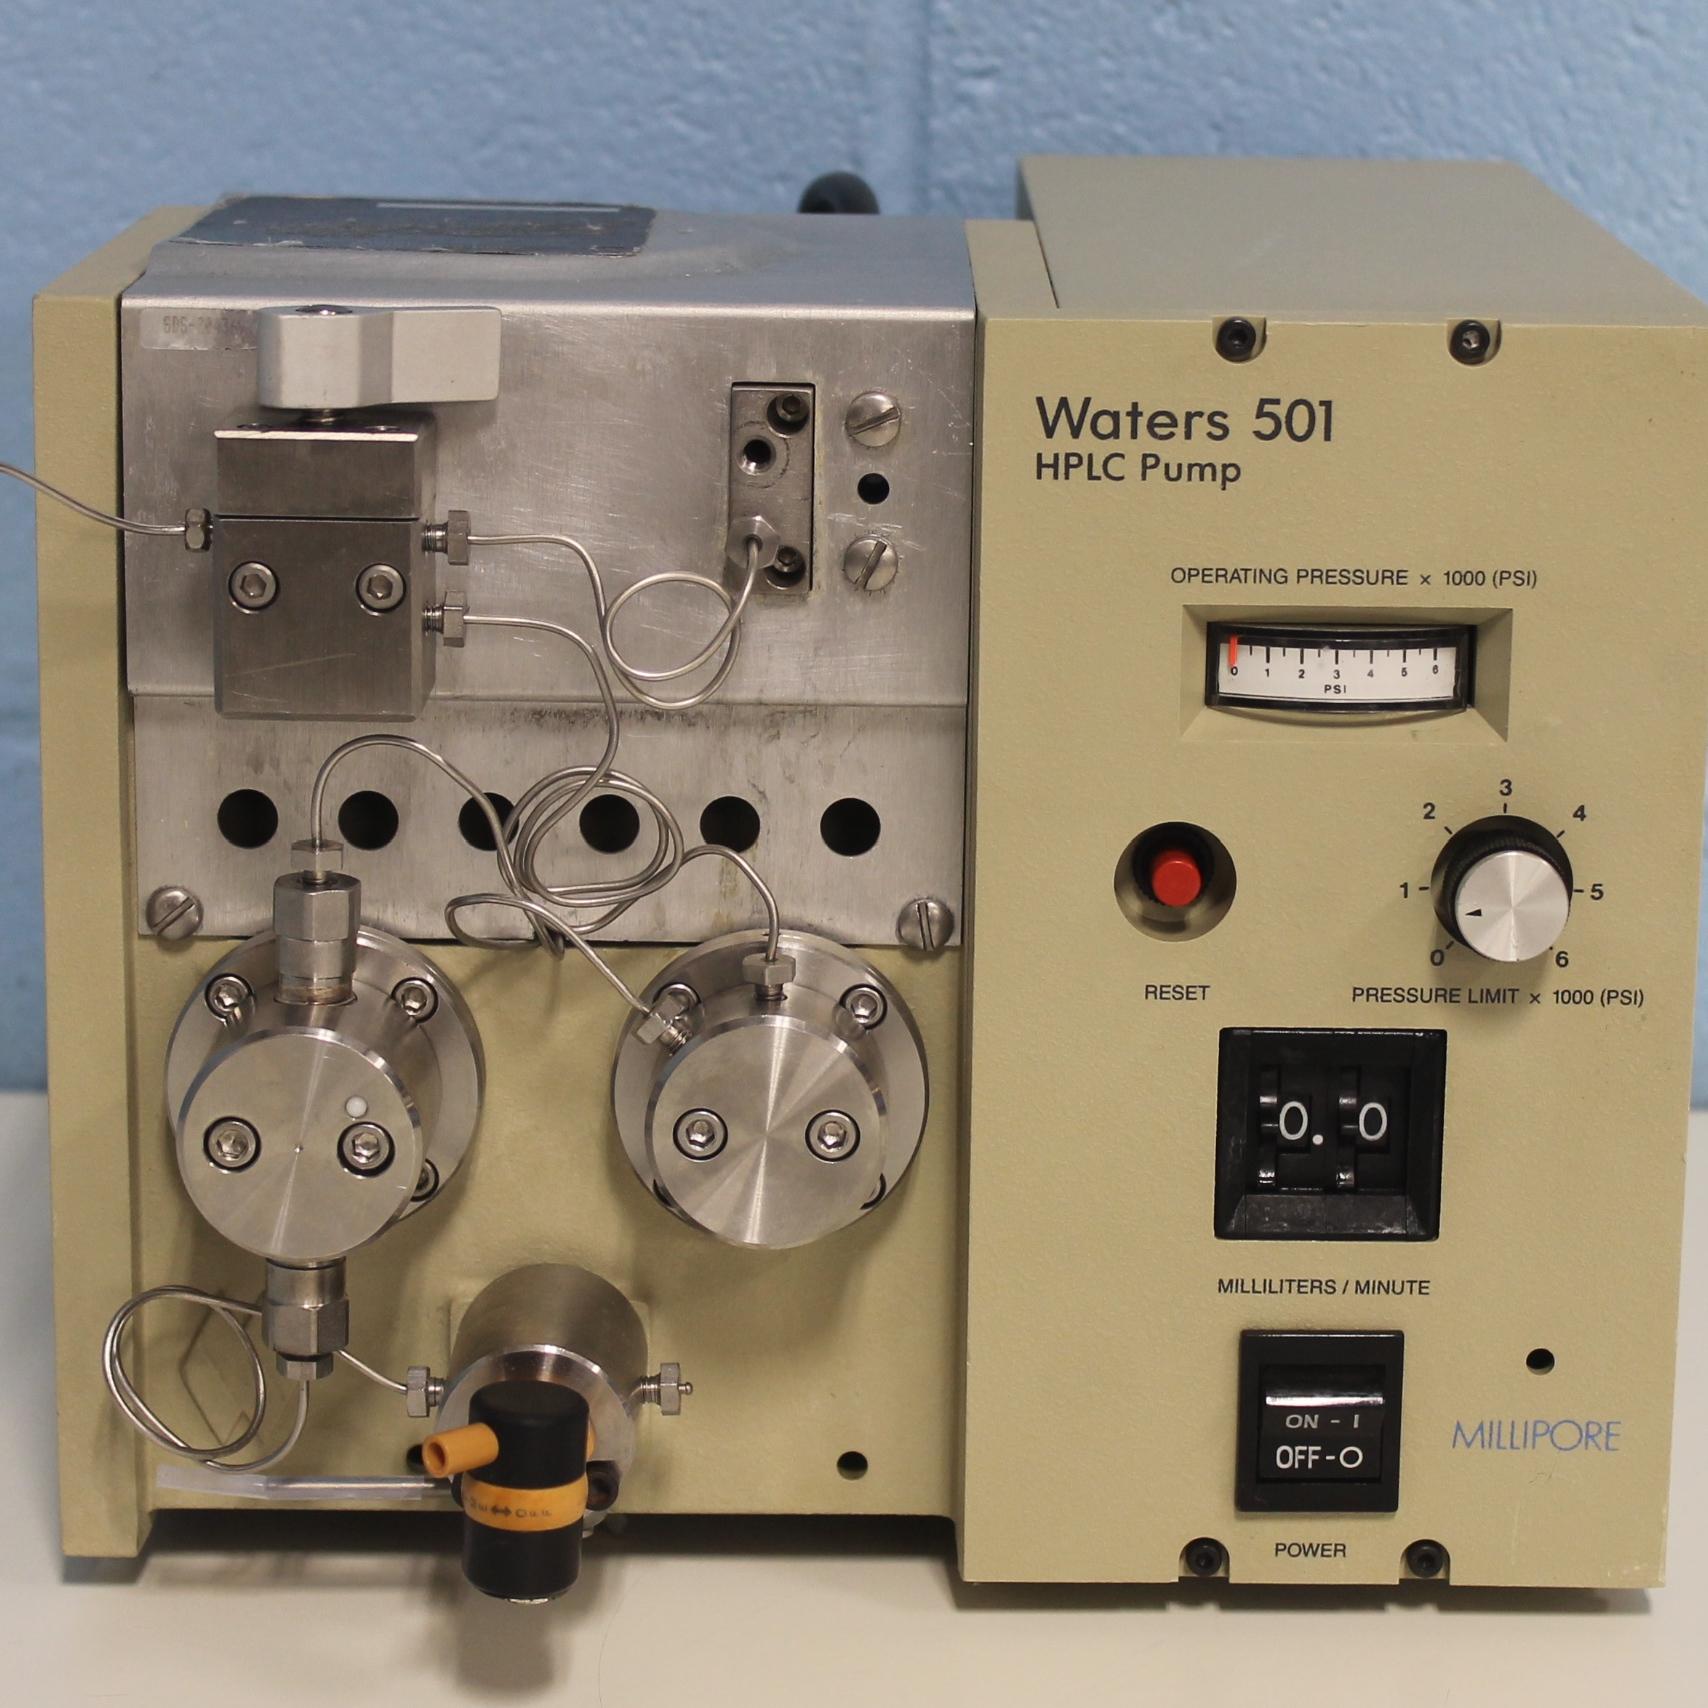 Waters 501 HPLC Pump Image